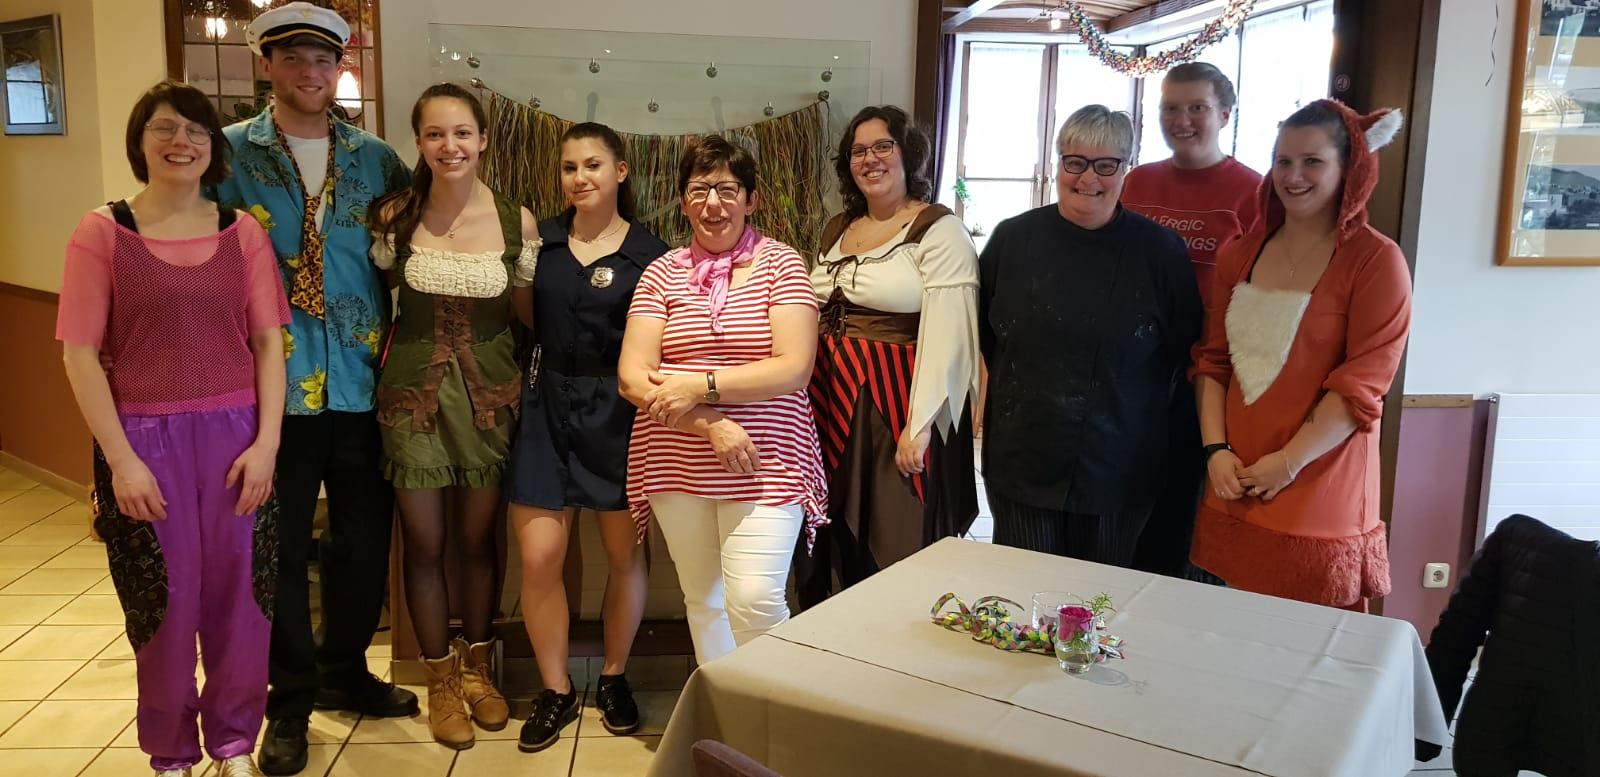 Klostermühle Ockfen Karneval 2020